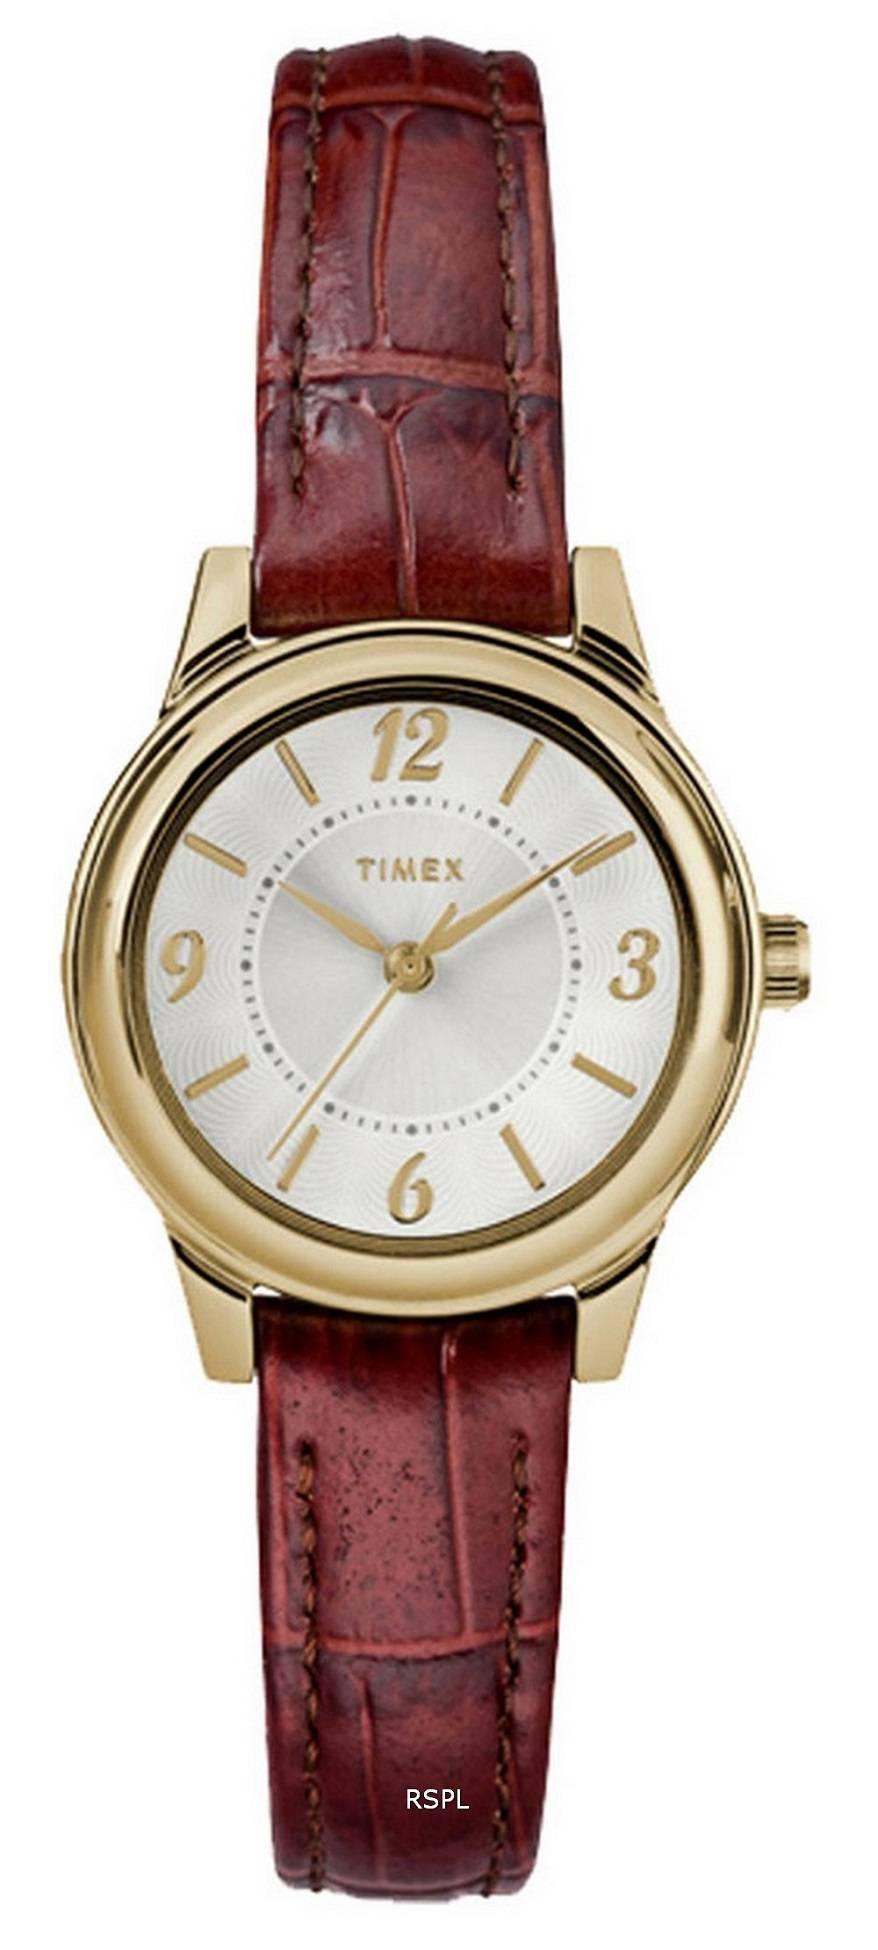 Timex Core Silver Dial Leather Strap Quartz TW2R85800 Womens Watch